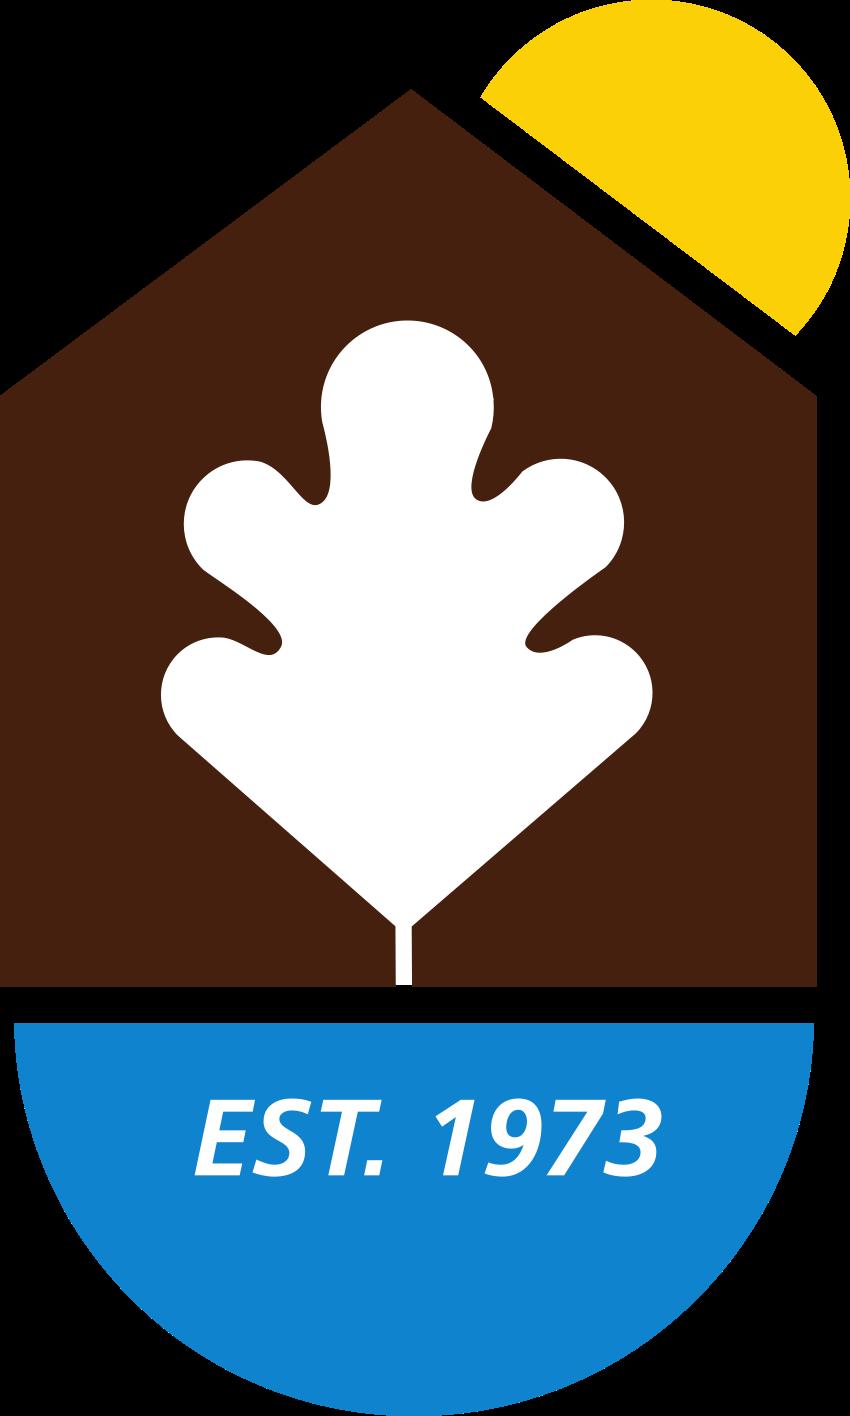 Est. 1973